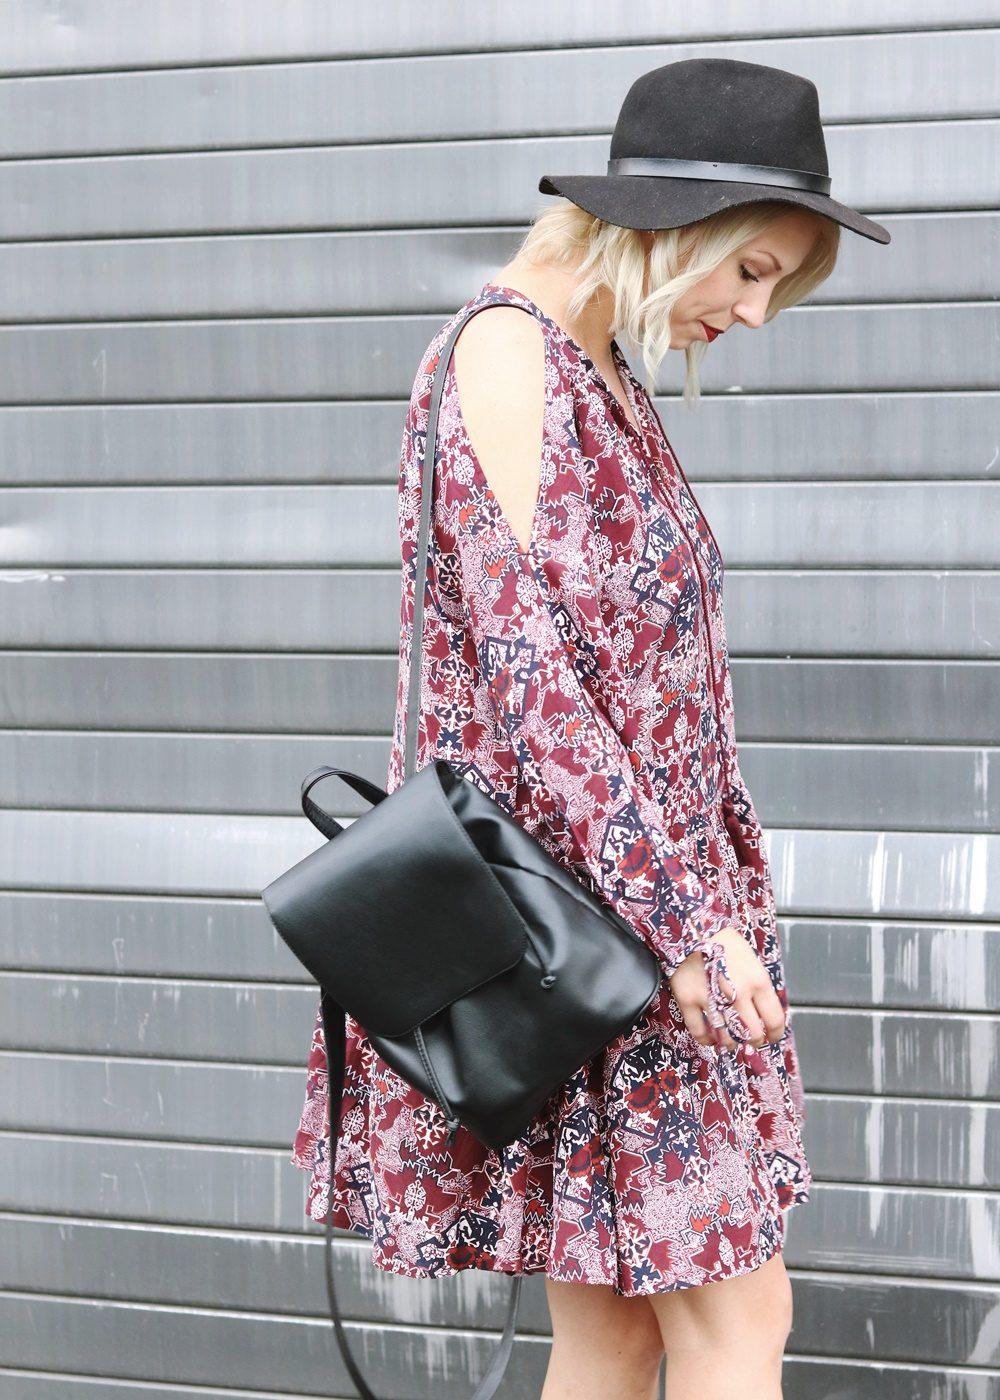 Fashionblogger Outfit Boho Kleid weinrot Bikerboots Rucksack Hut Ethno (10)